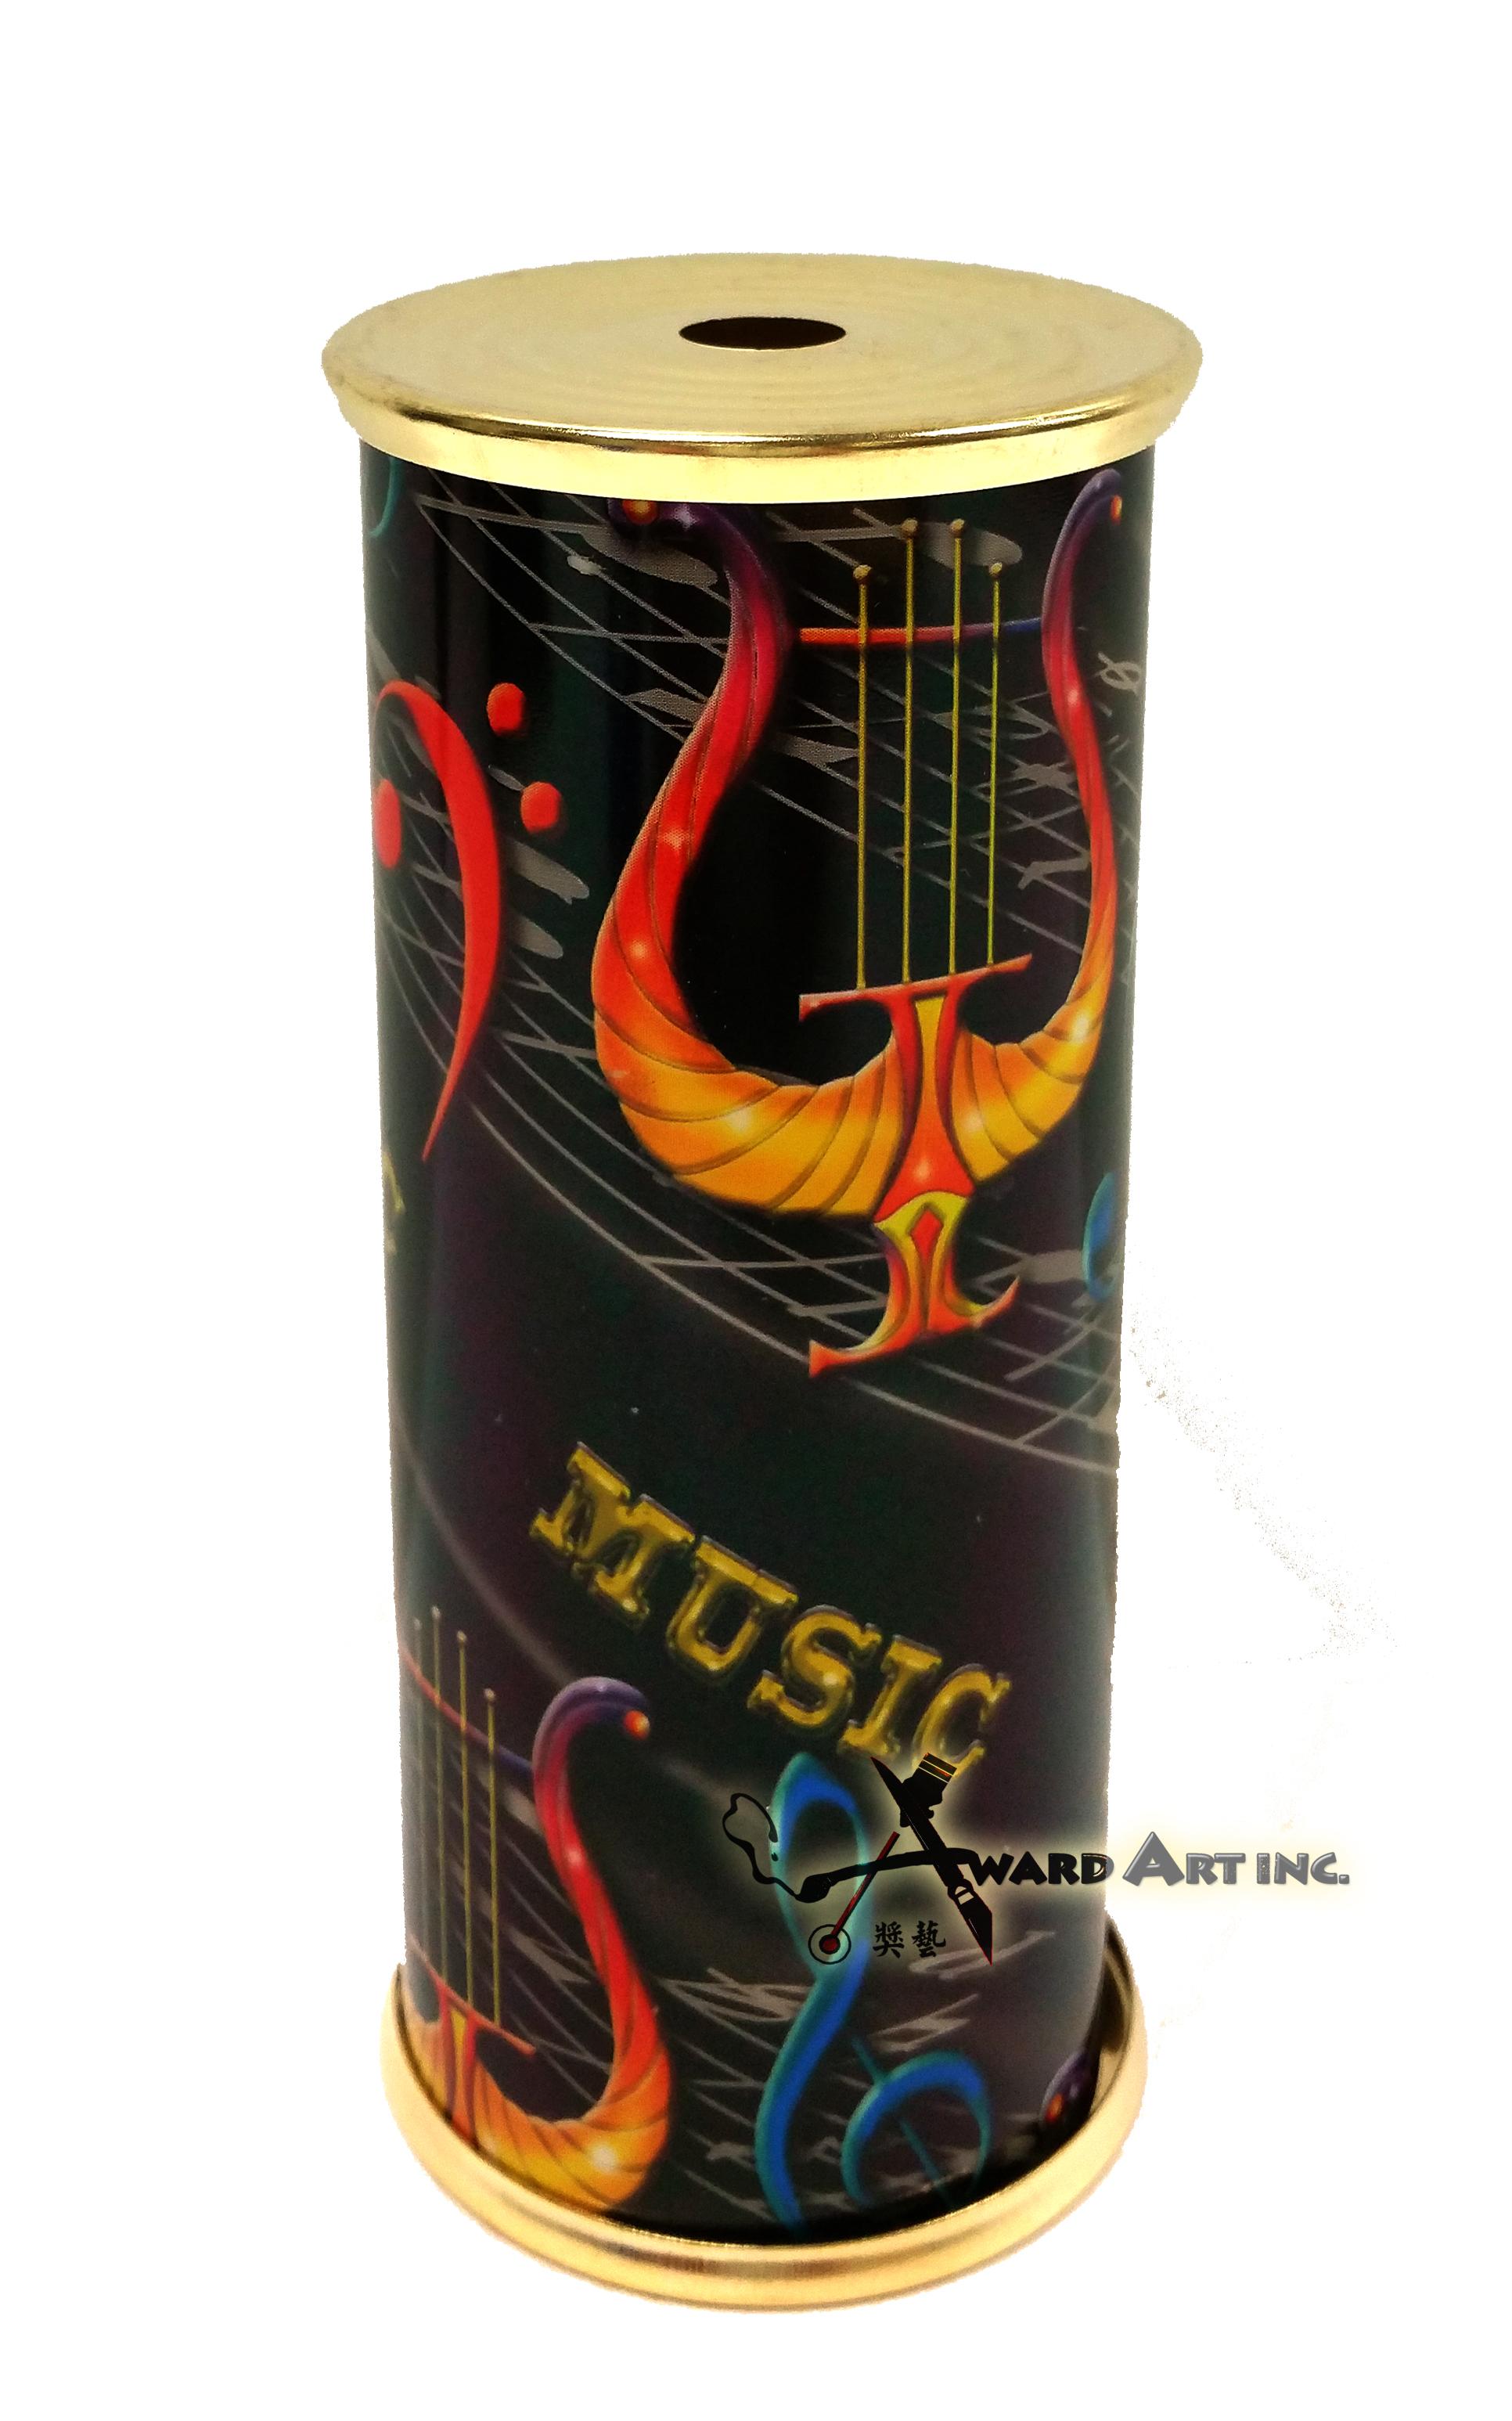 MUSIC COLUMN - MULTICOLOR